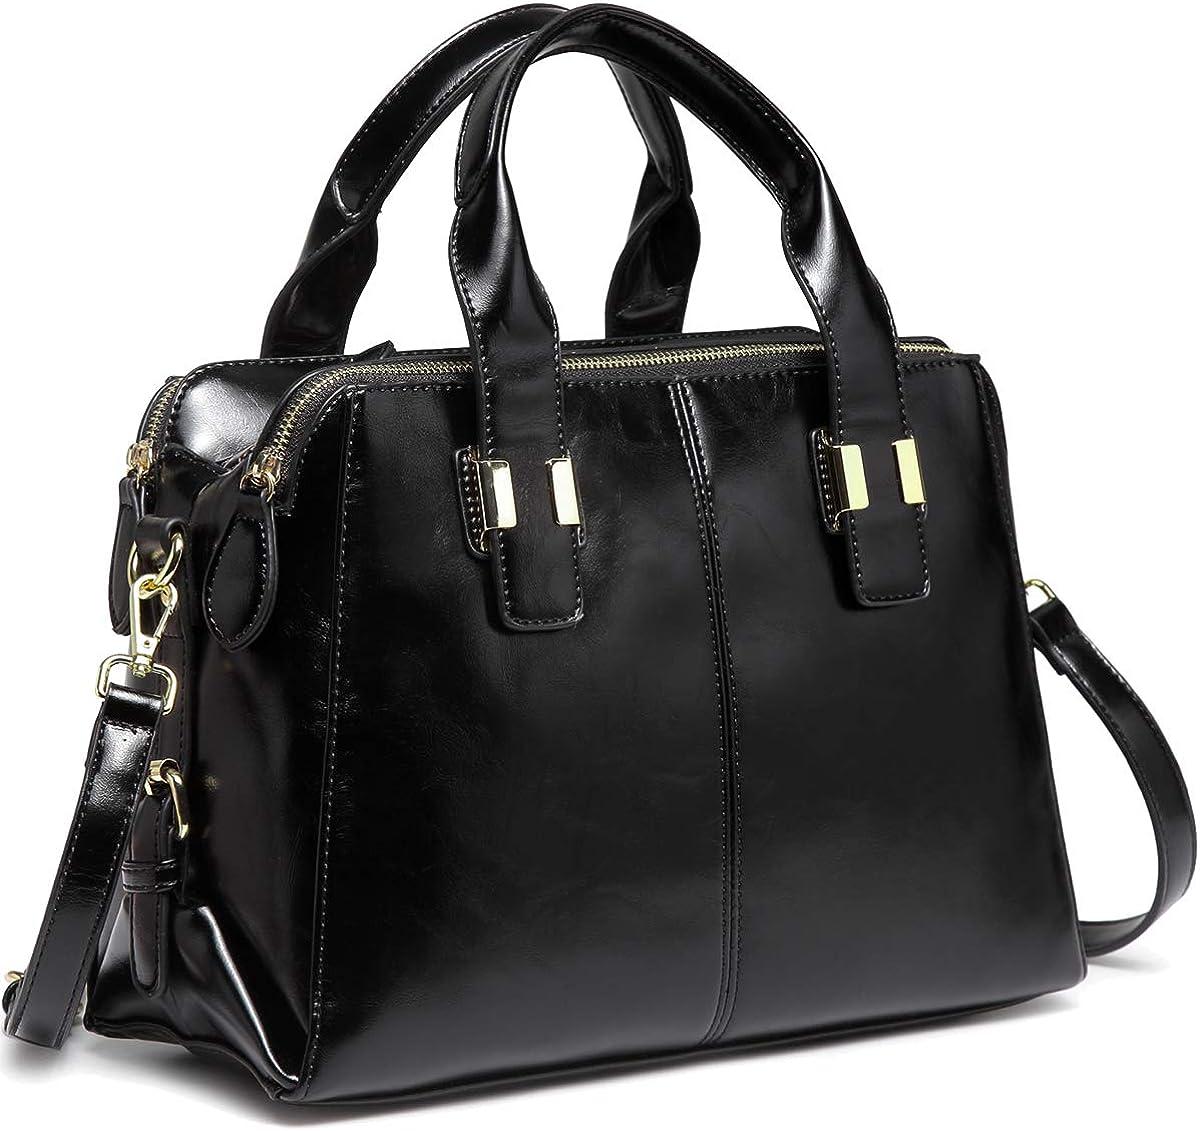 Fashion Ladies Faux Leather Tote Bag Women Shoulder Handbag Satchel Office Work